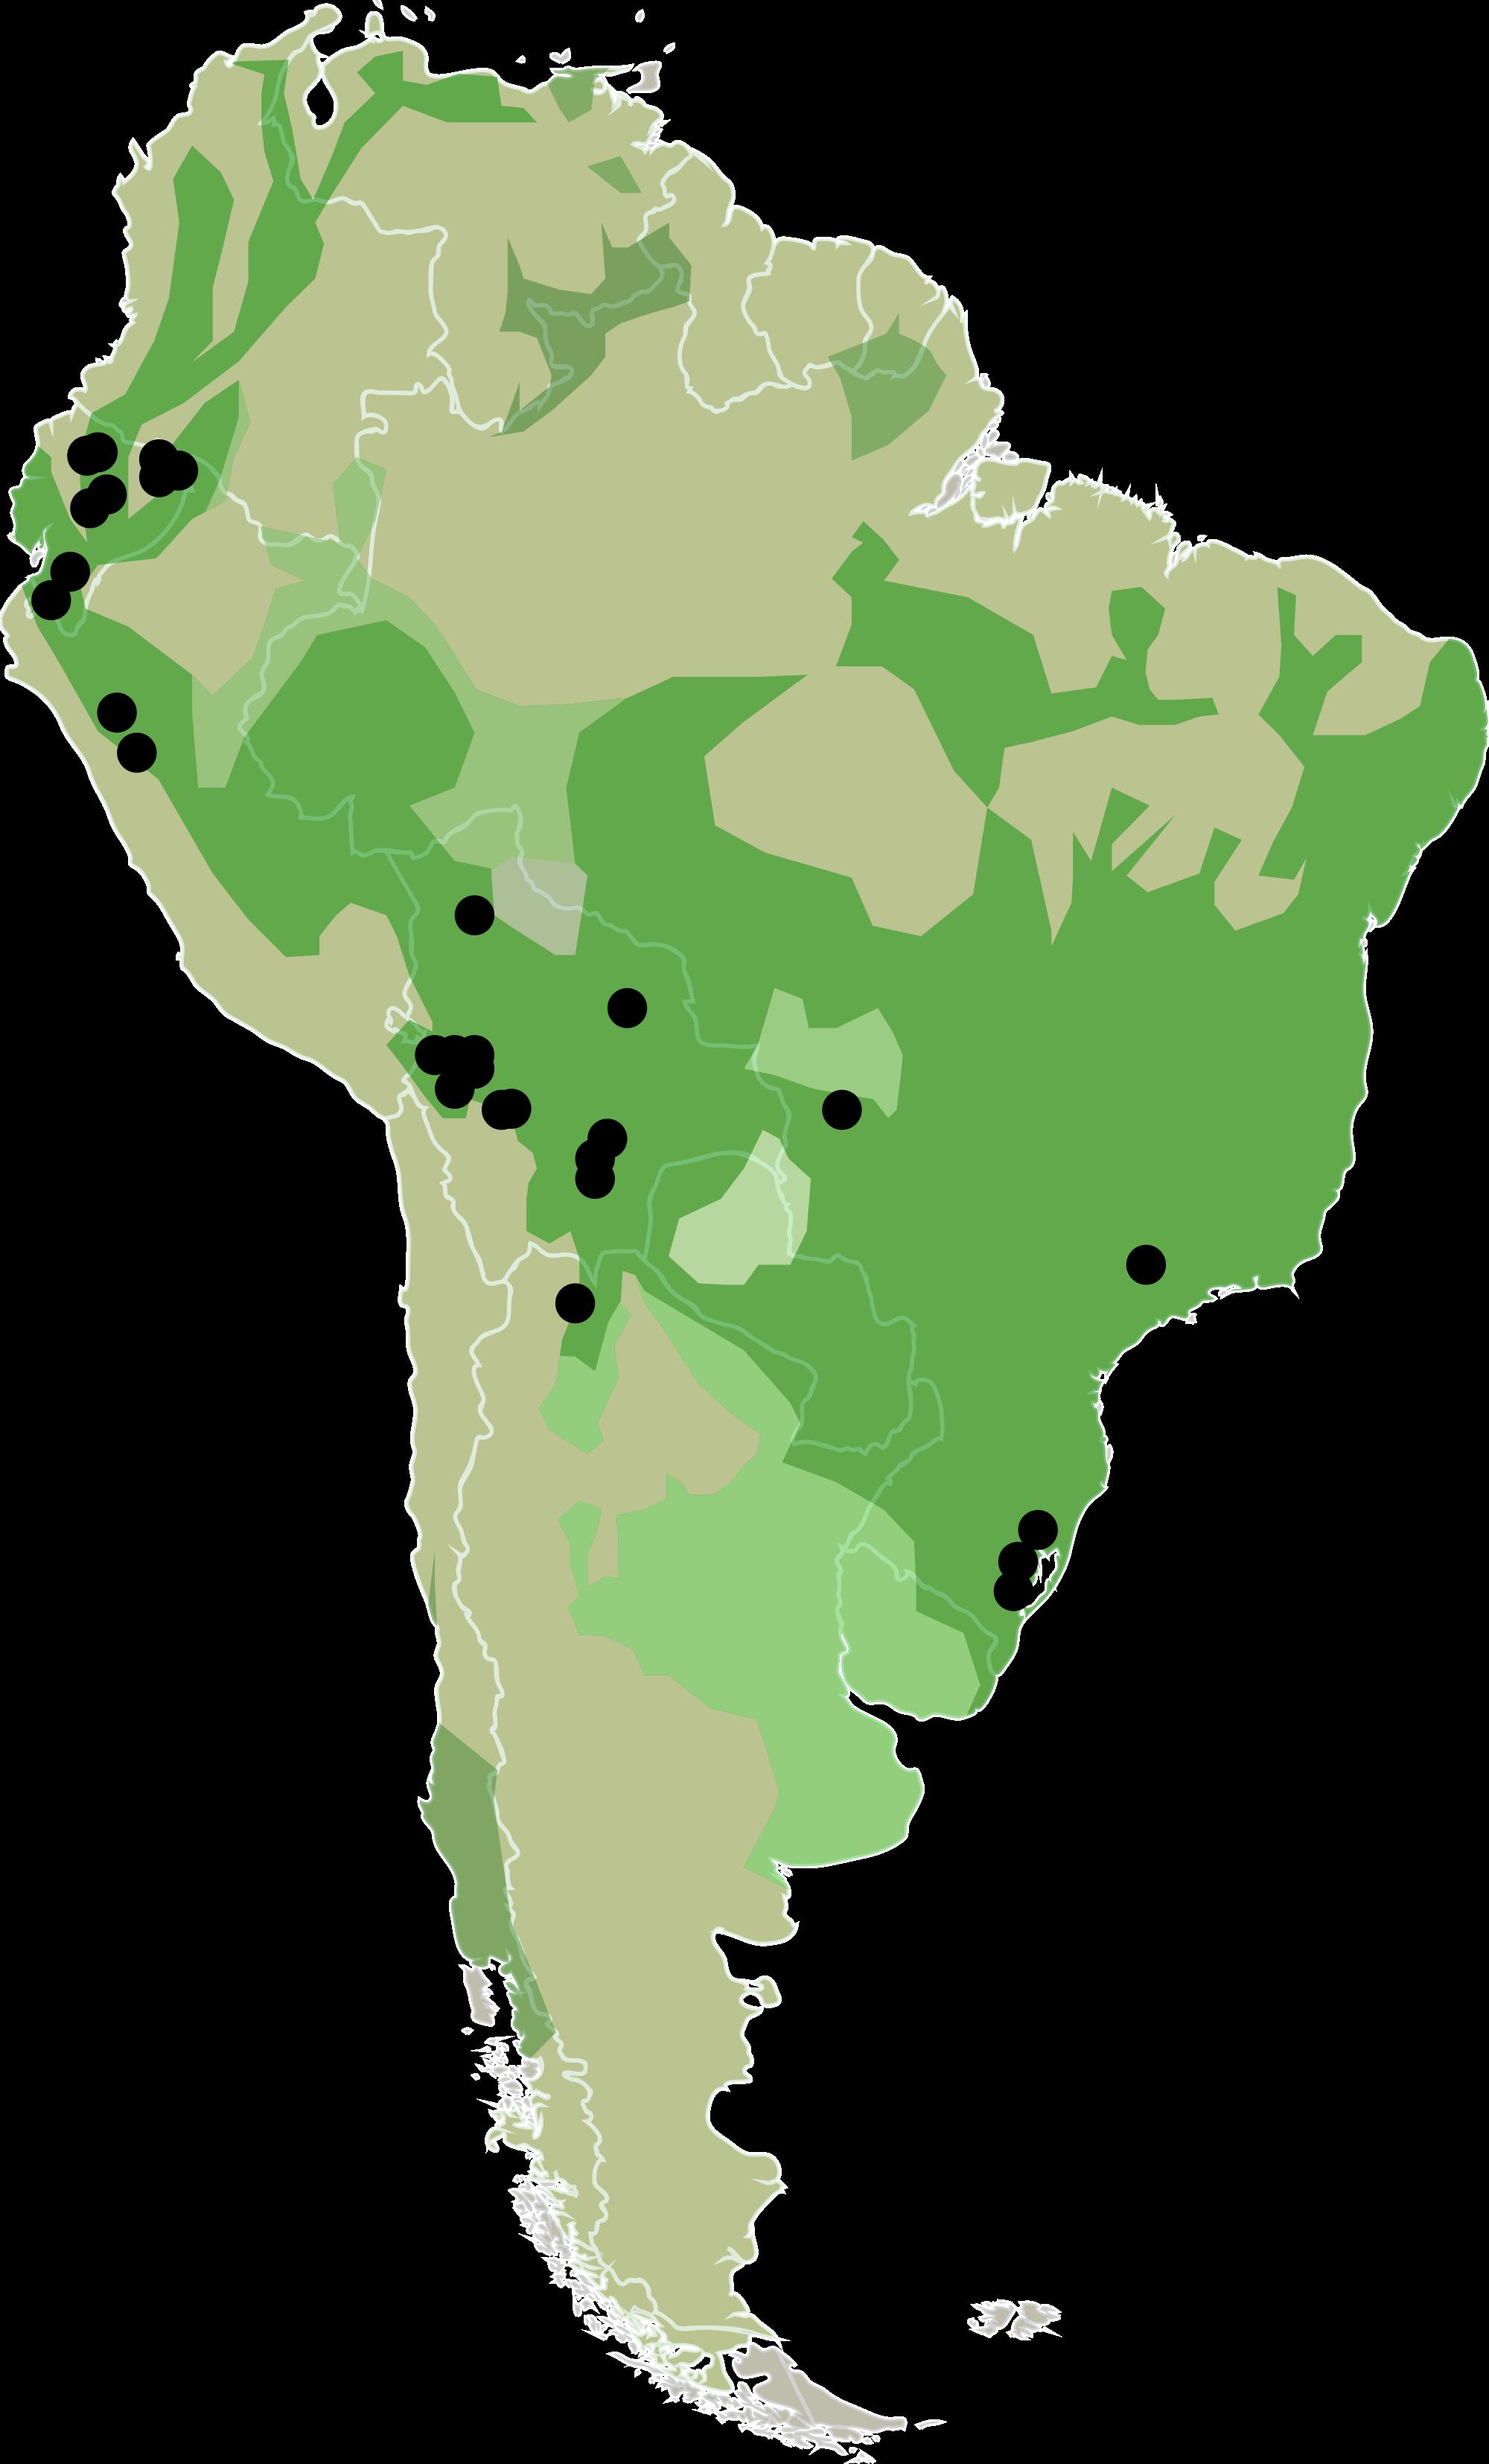 File:Cucurbita ficifolia.